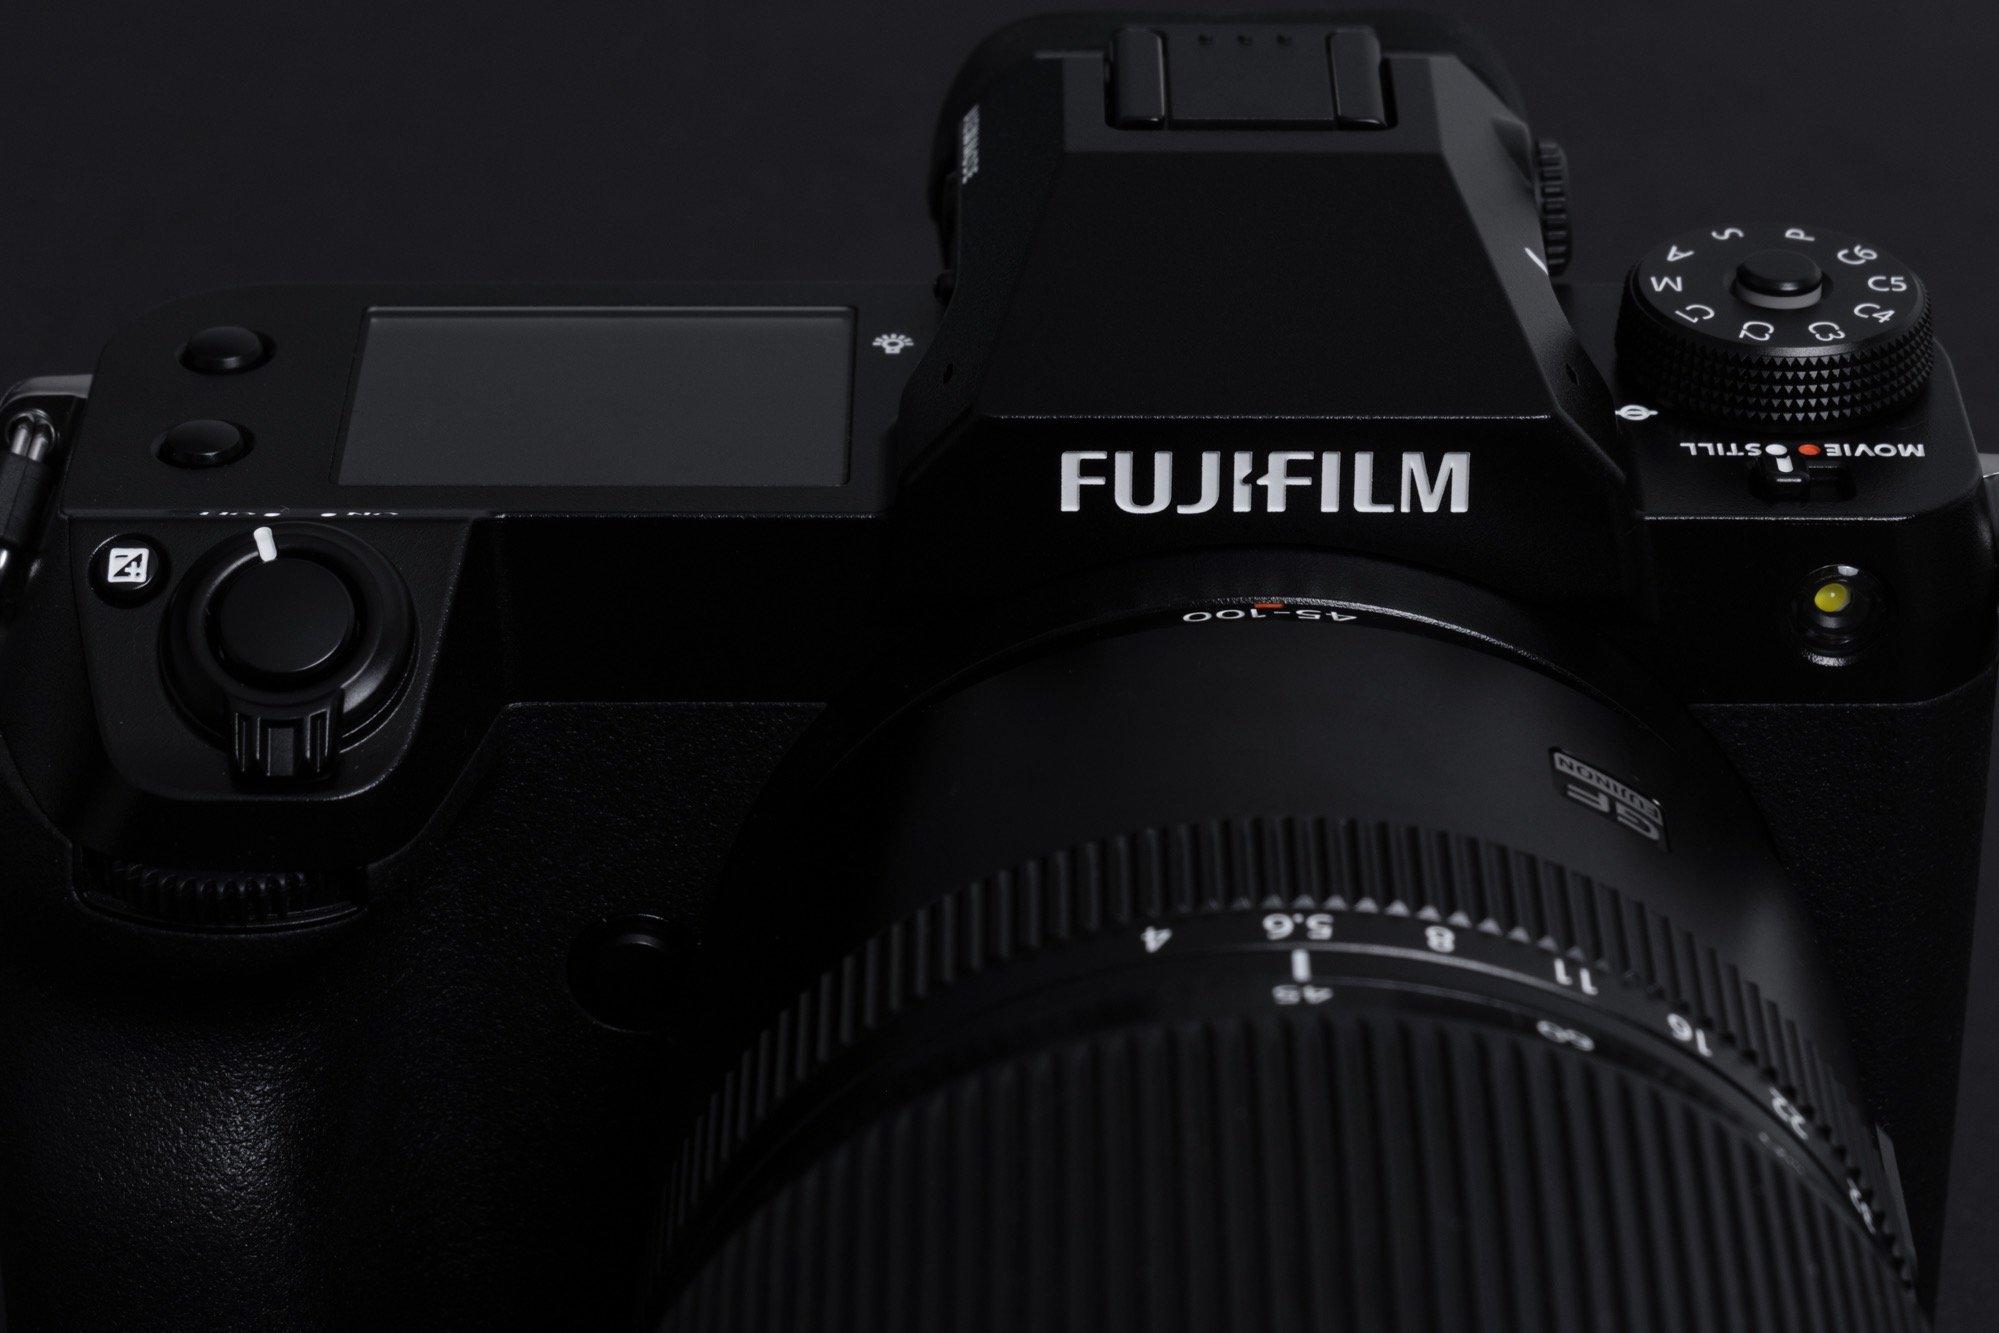 FUJIFILM GF 45-100mm lens Product Review Photography Singapore Jose Jeuland 5